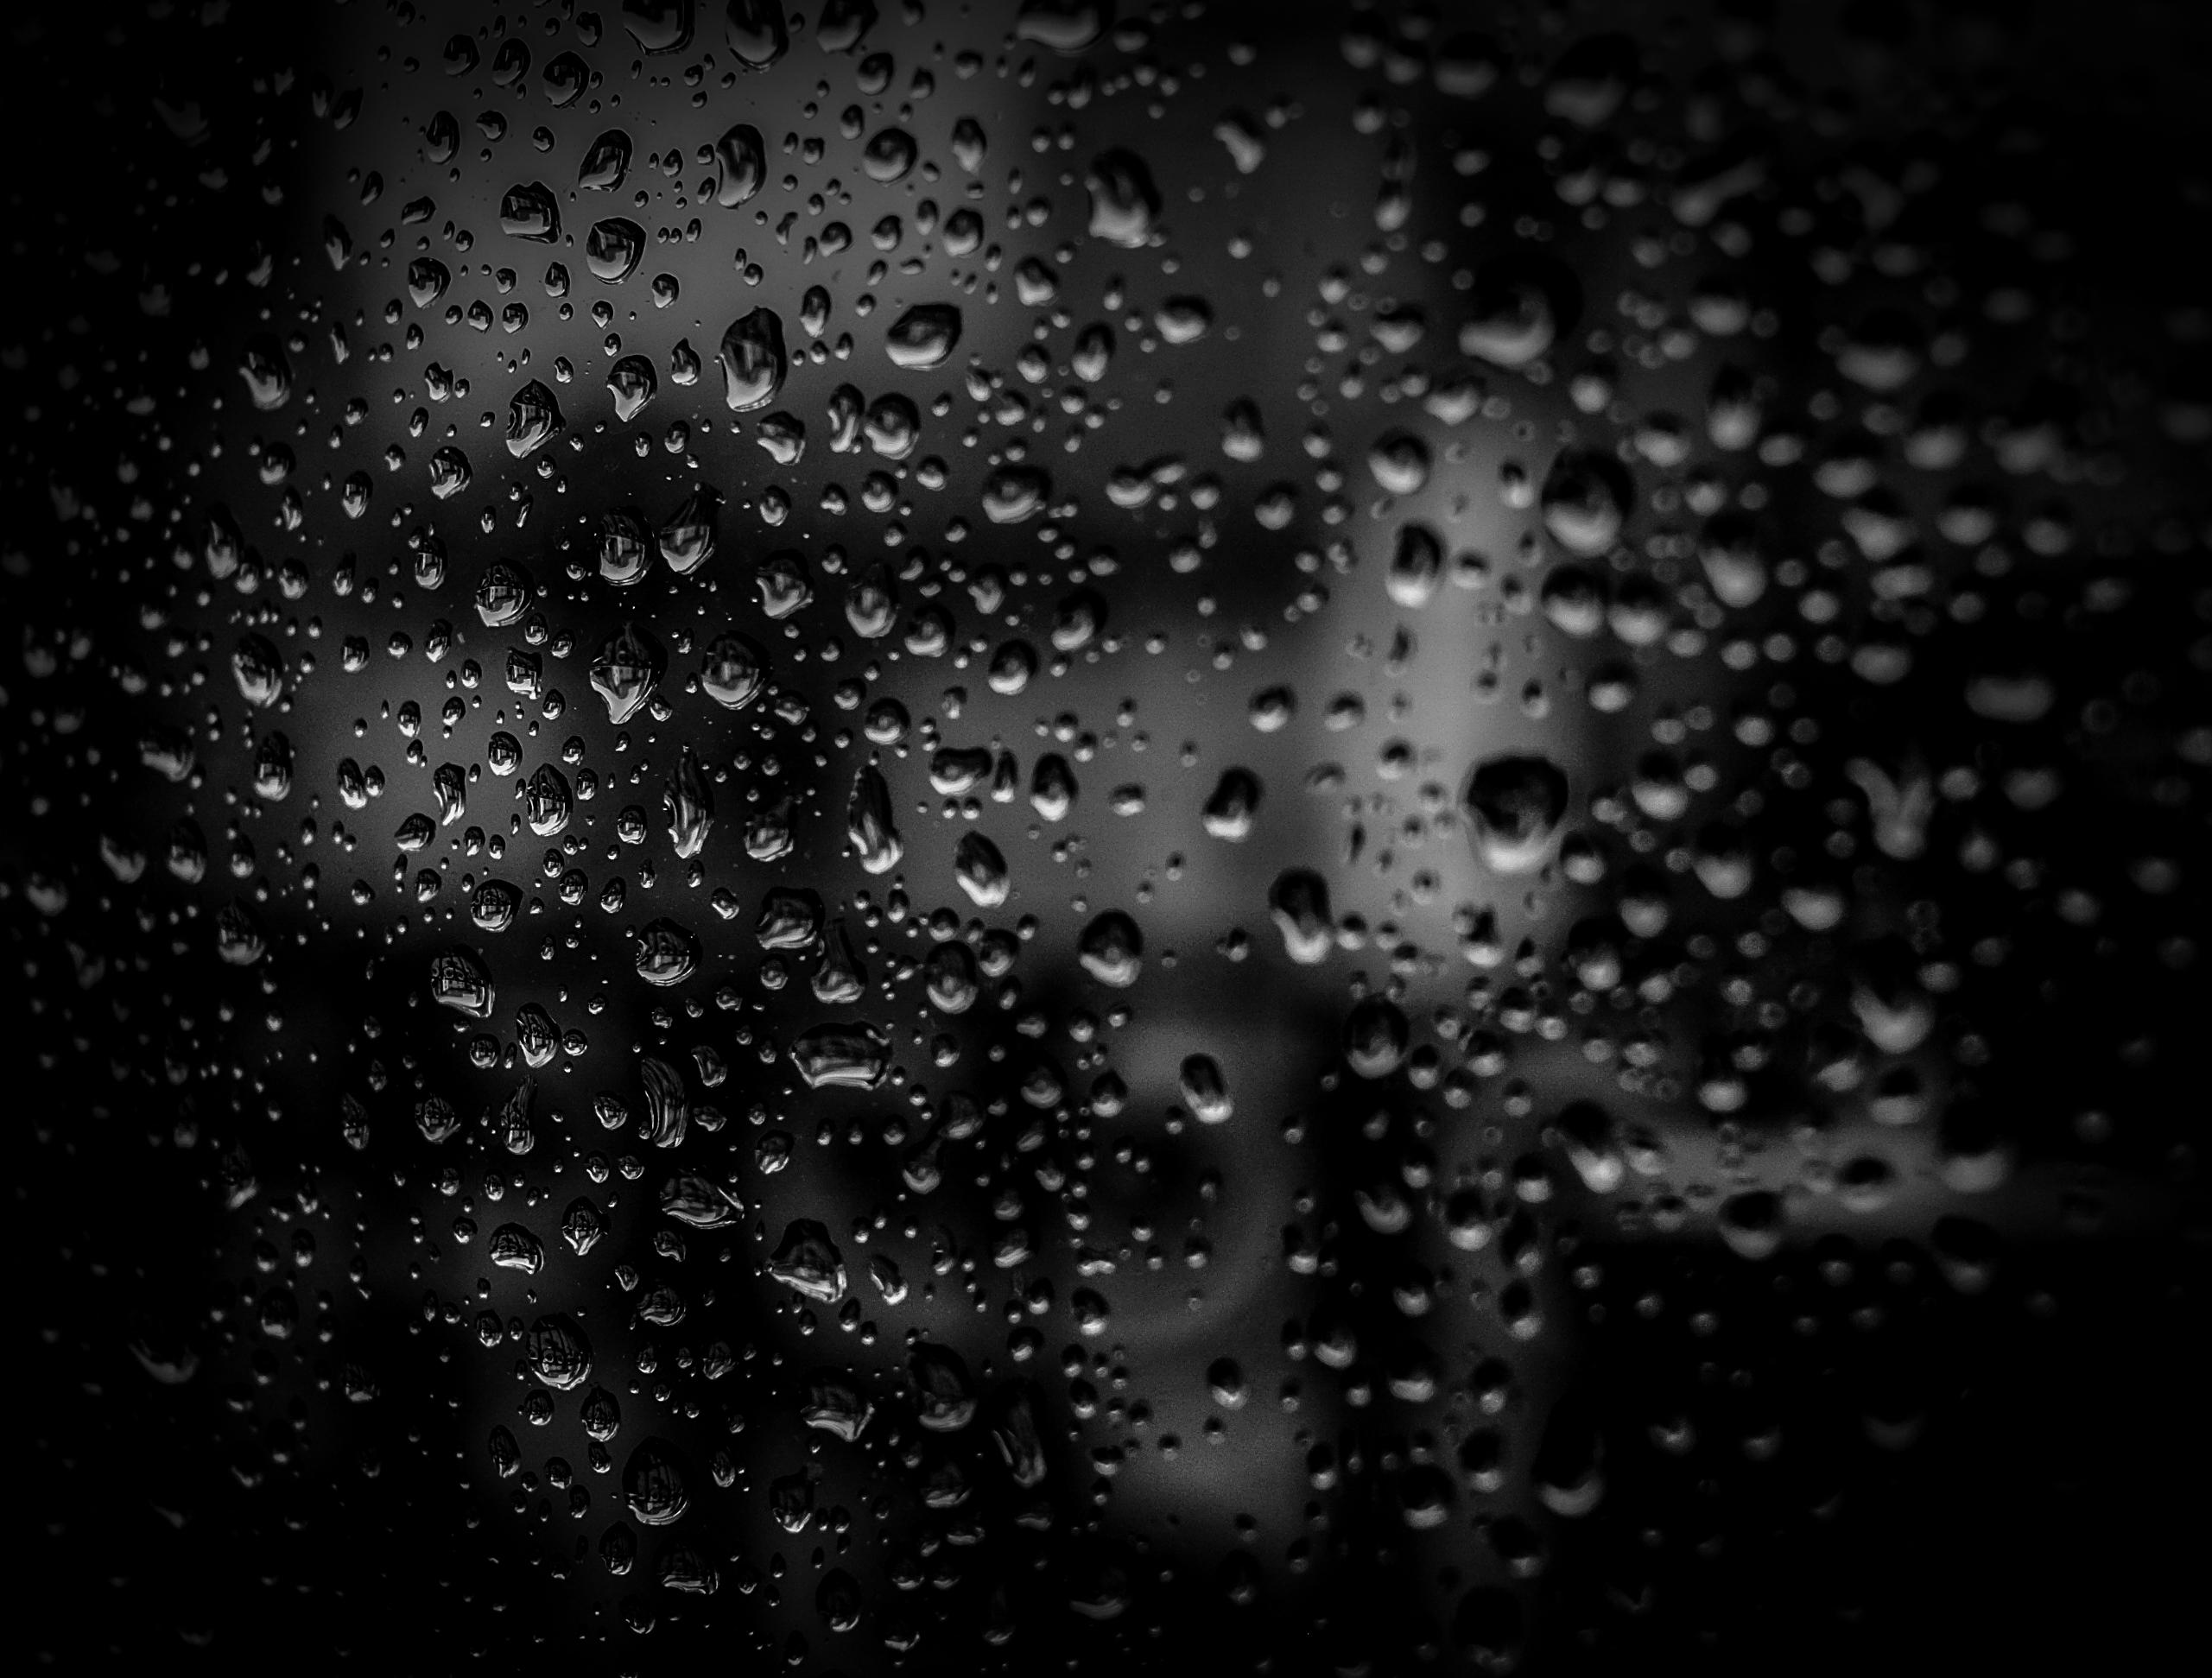 Black Wallpaper · Pexels · Free Stock Photos